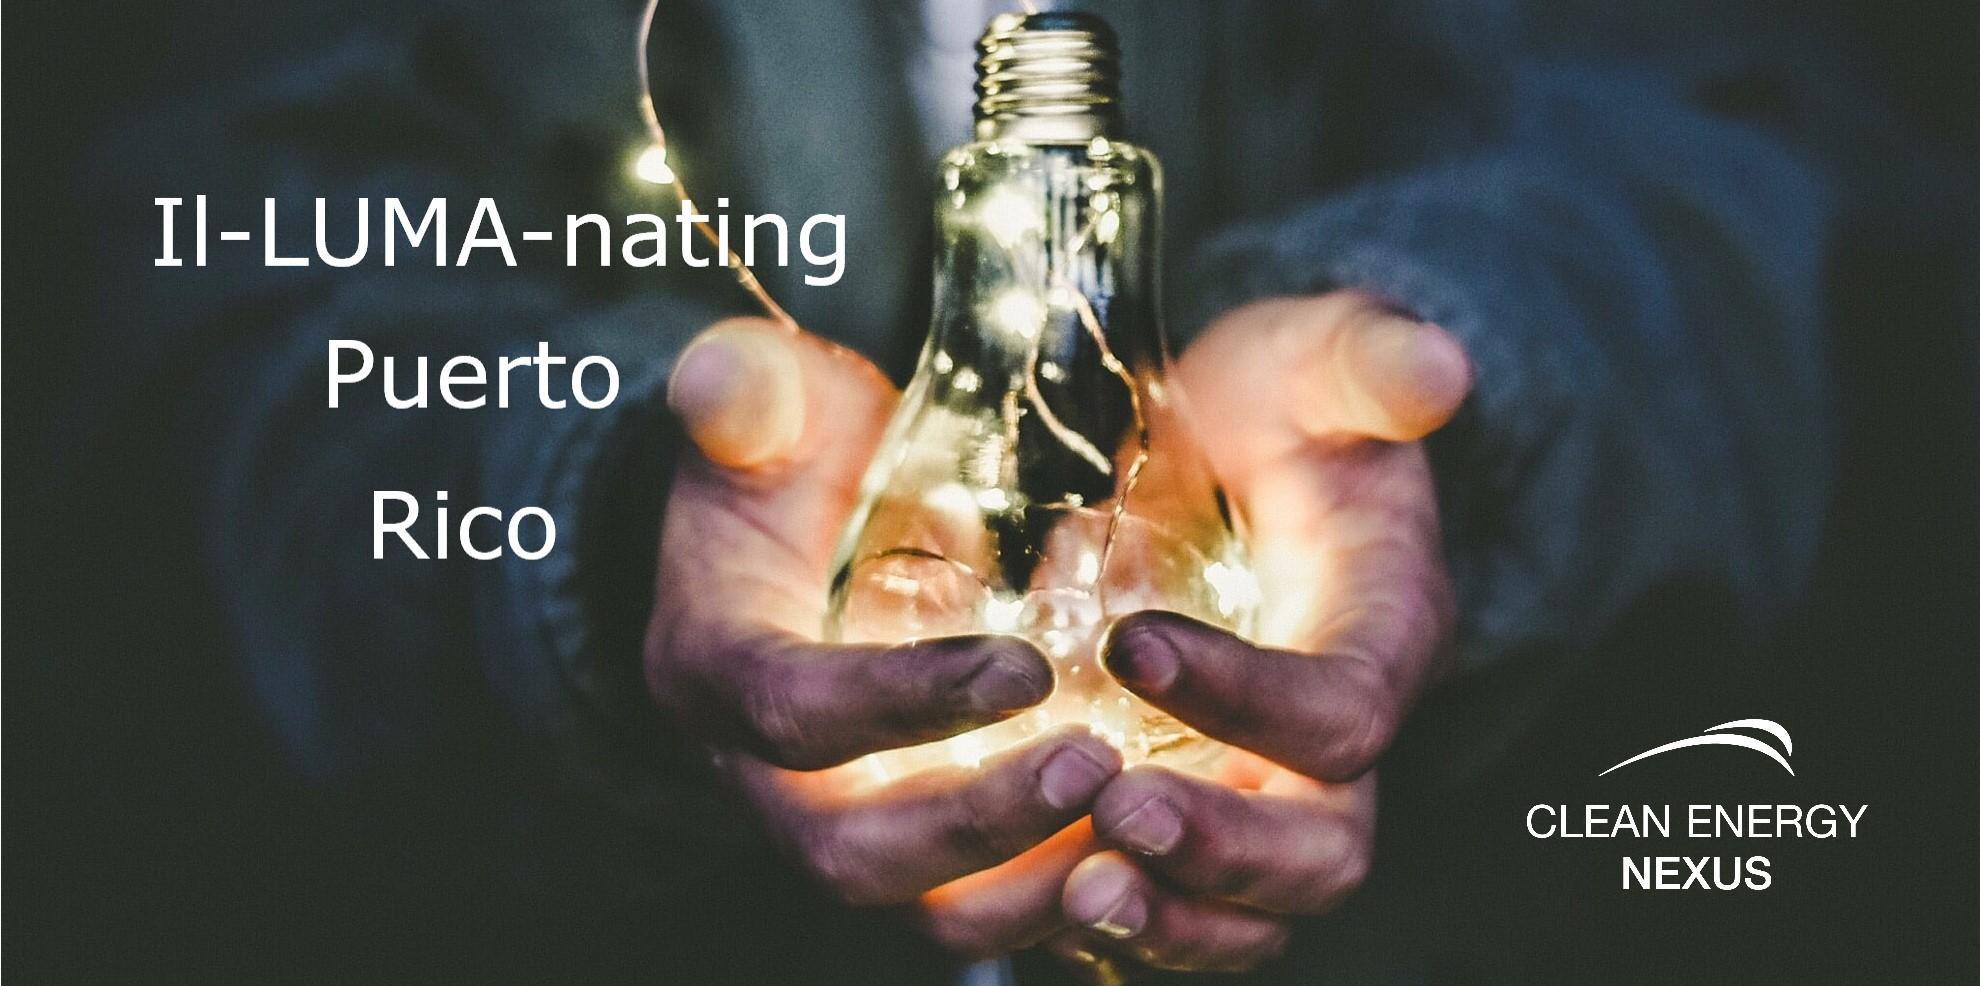 Il-LUMA-nating Puerto Rico